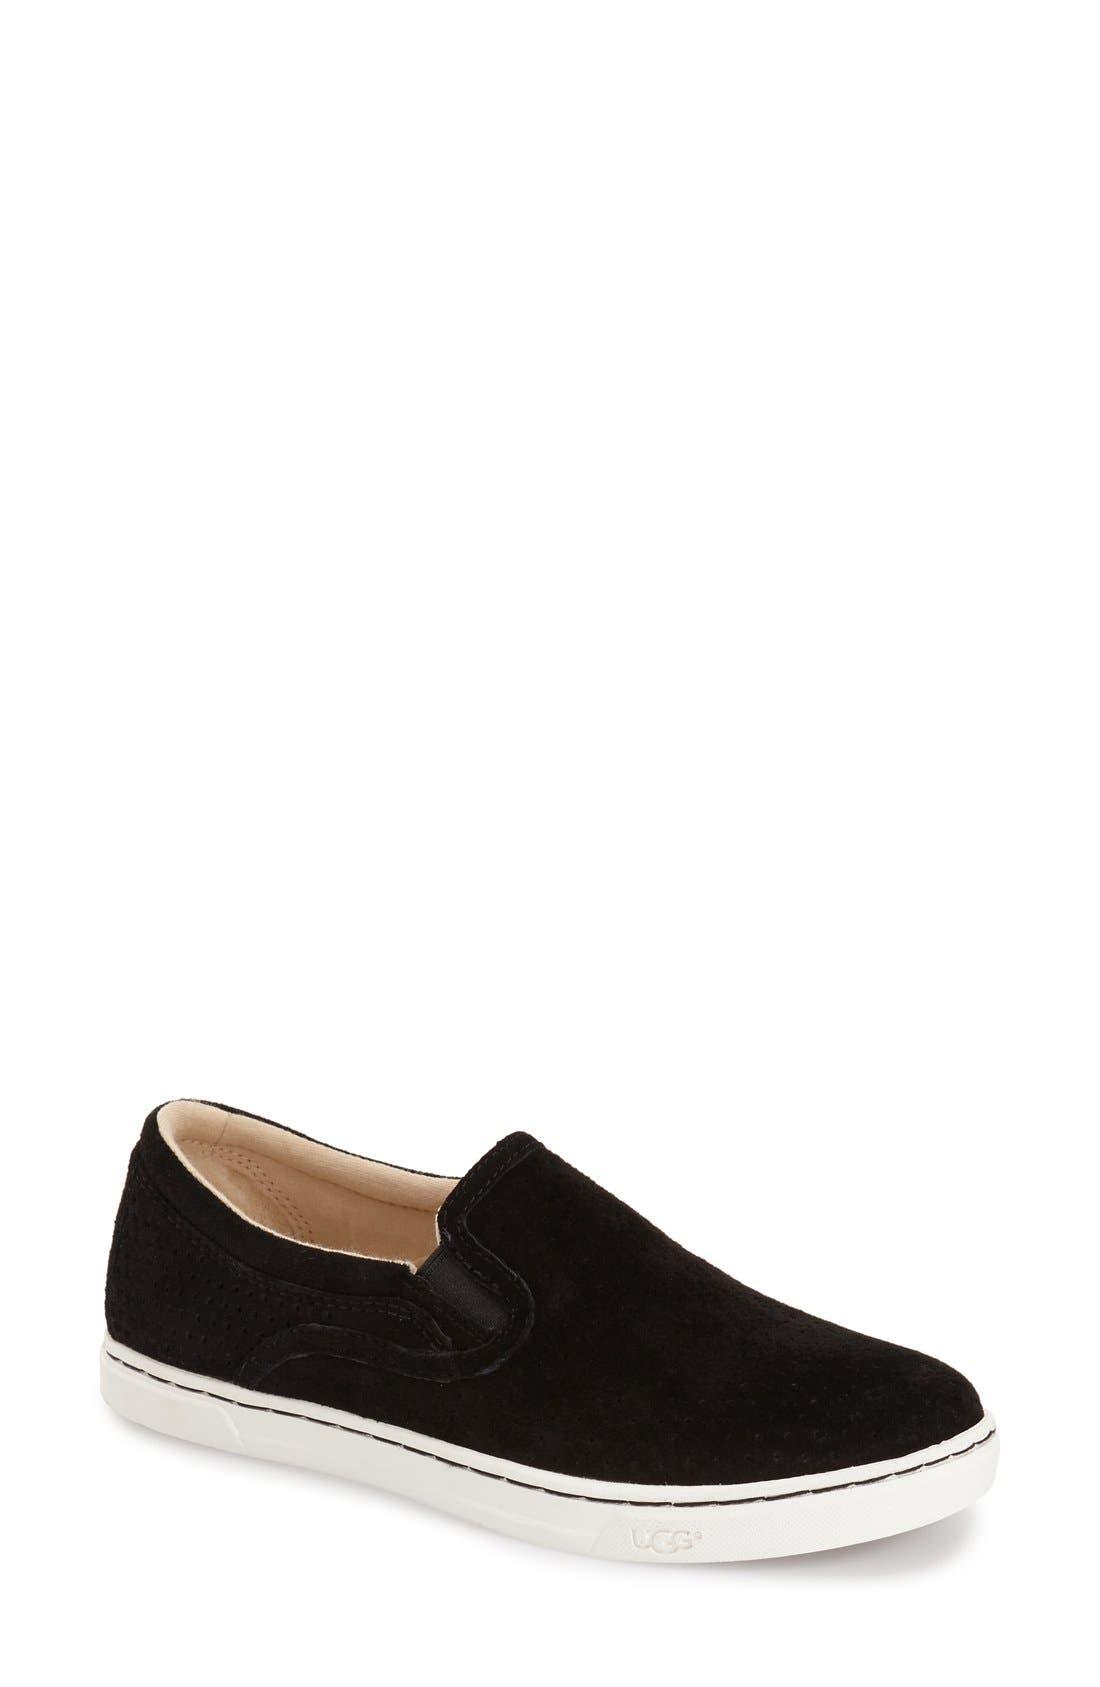 'Fierce Geo' Perforated Slip-On Sneaker,                         Main,                         color,